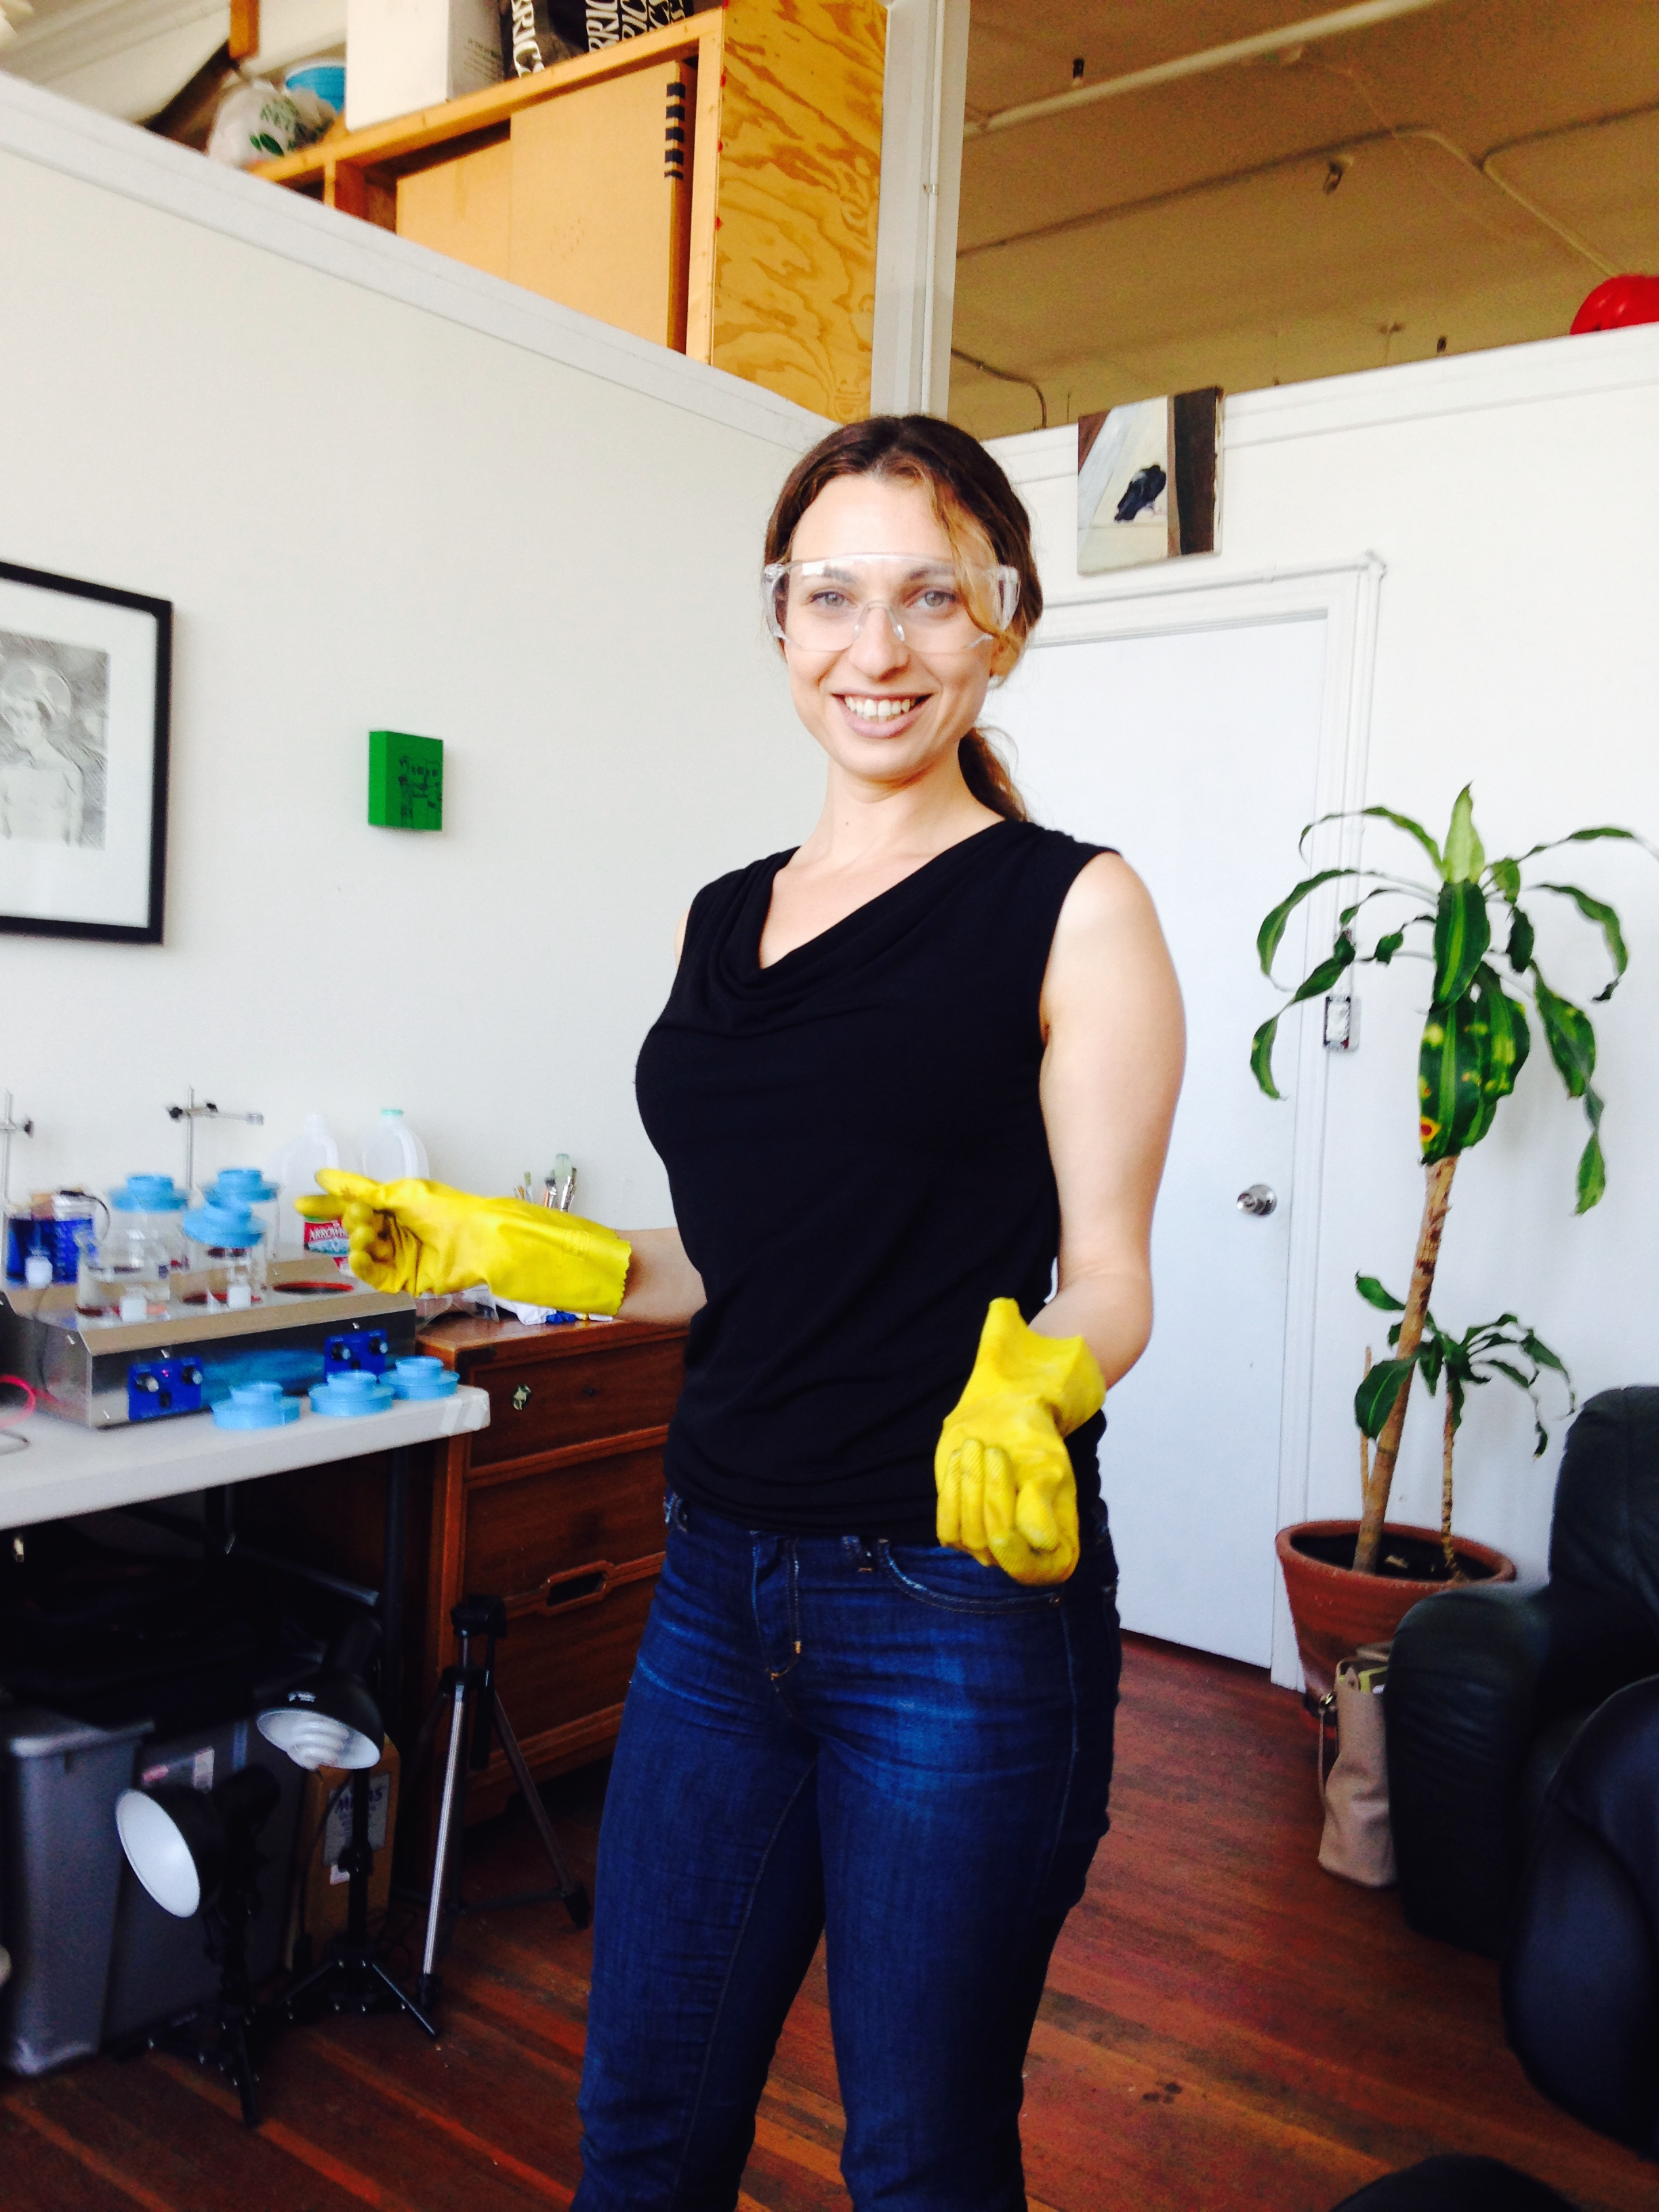 Lauren Marchetti in her artist space at studio 17